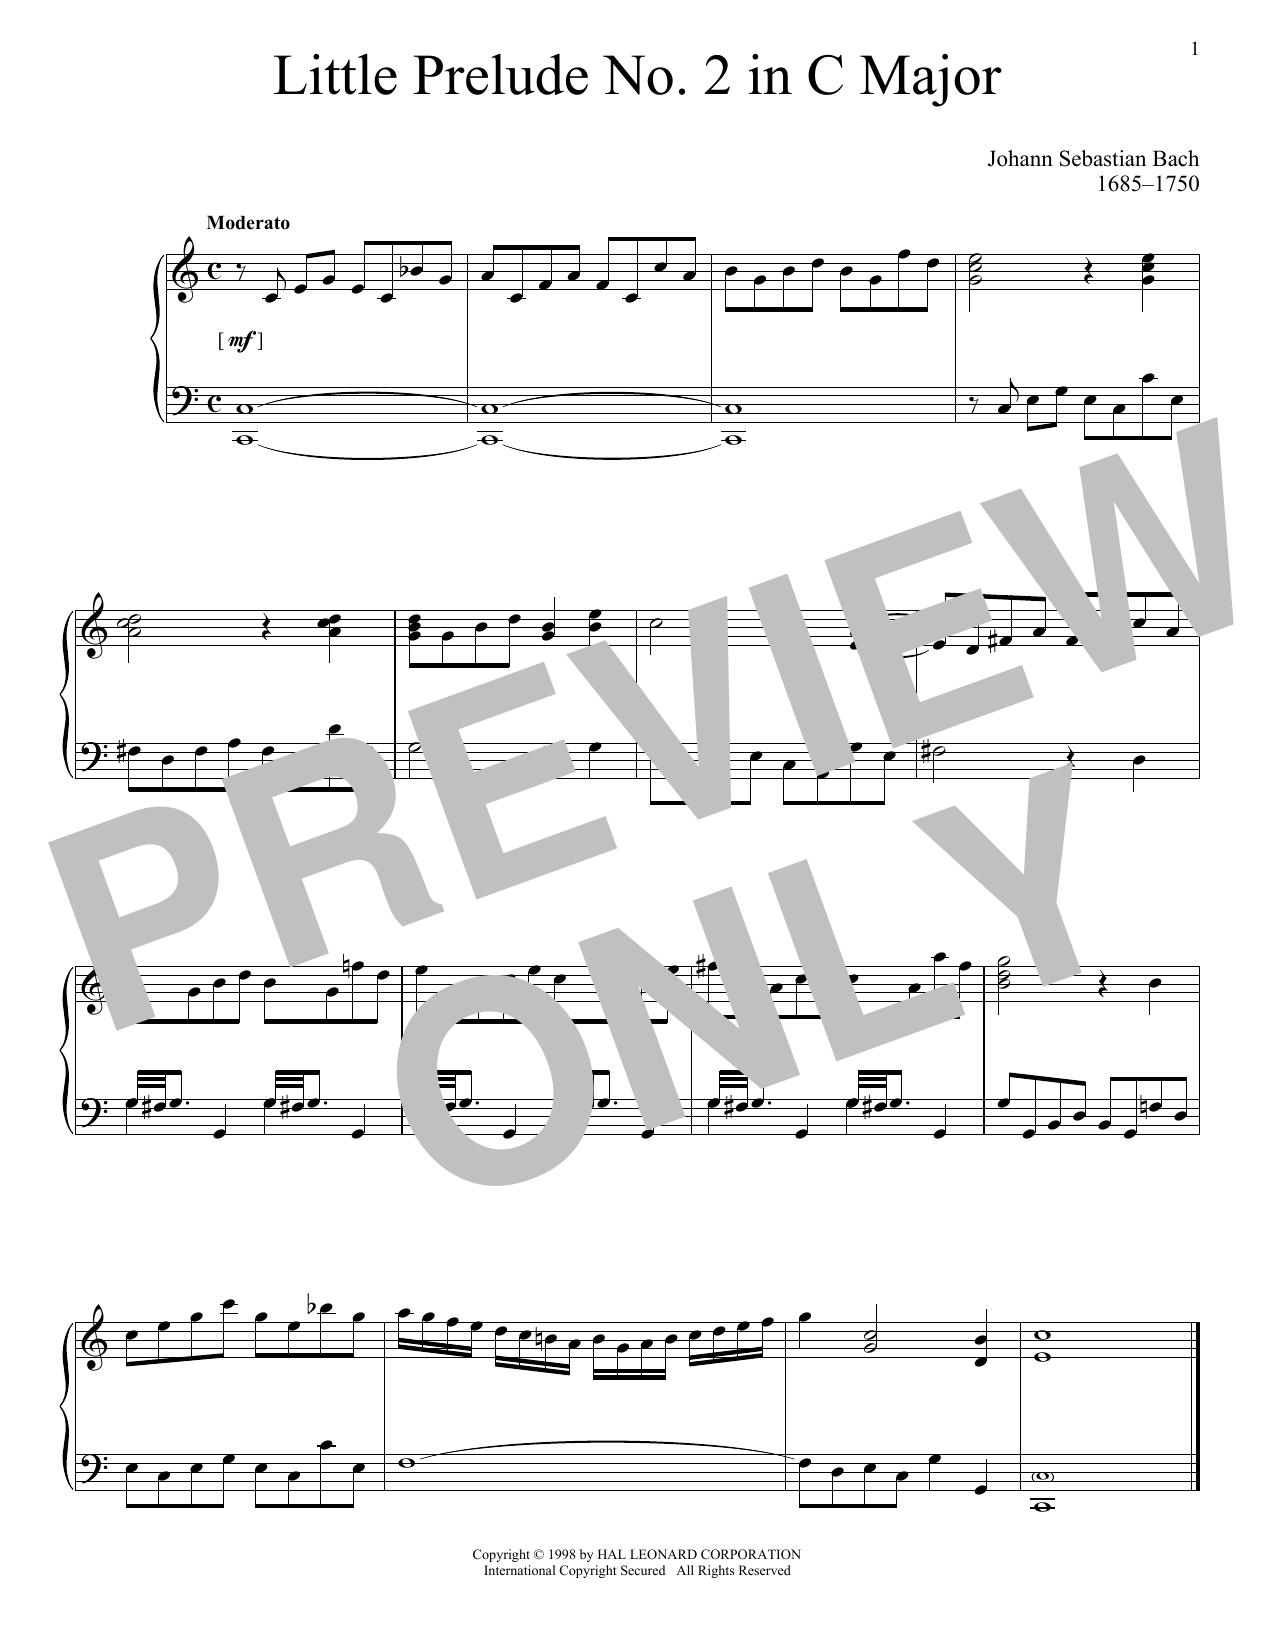 Little Prelude No. 2 in C Major